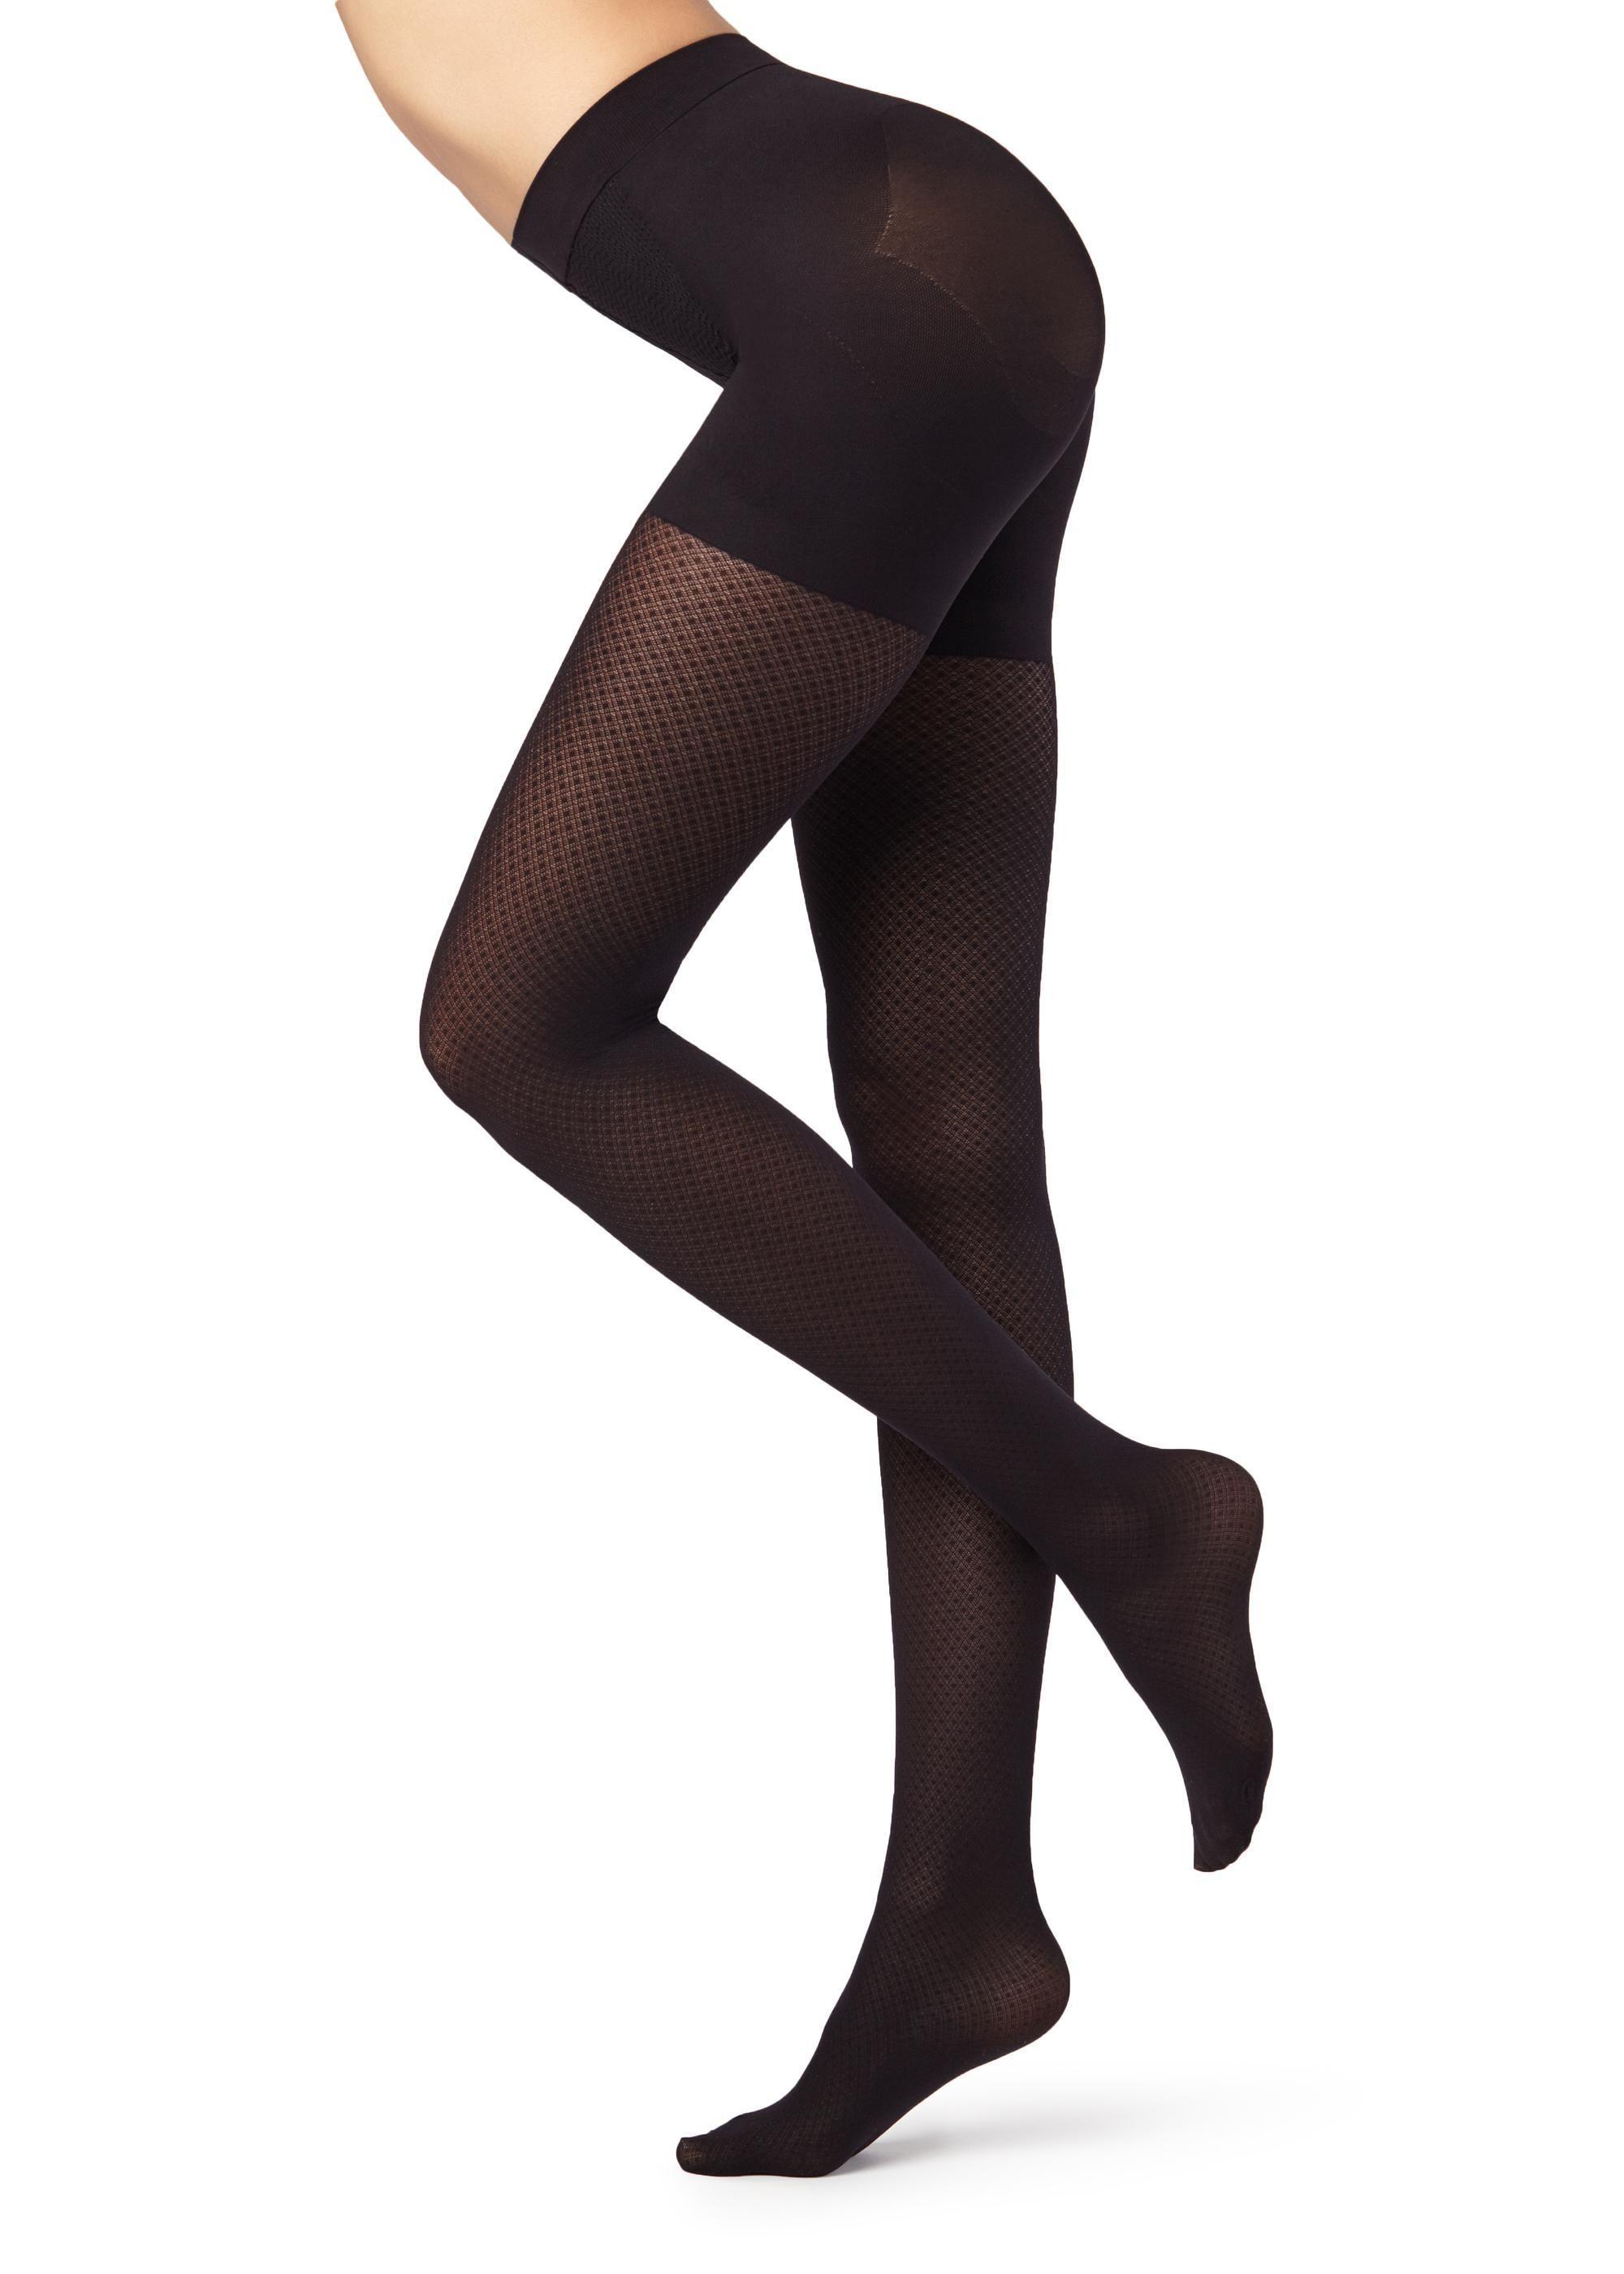 migliori offerte su rivenditore online metà fuori Pin by Mateusz Welka on Nice | Tights, Stockings, Leggings